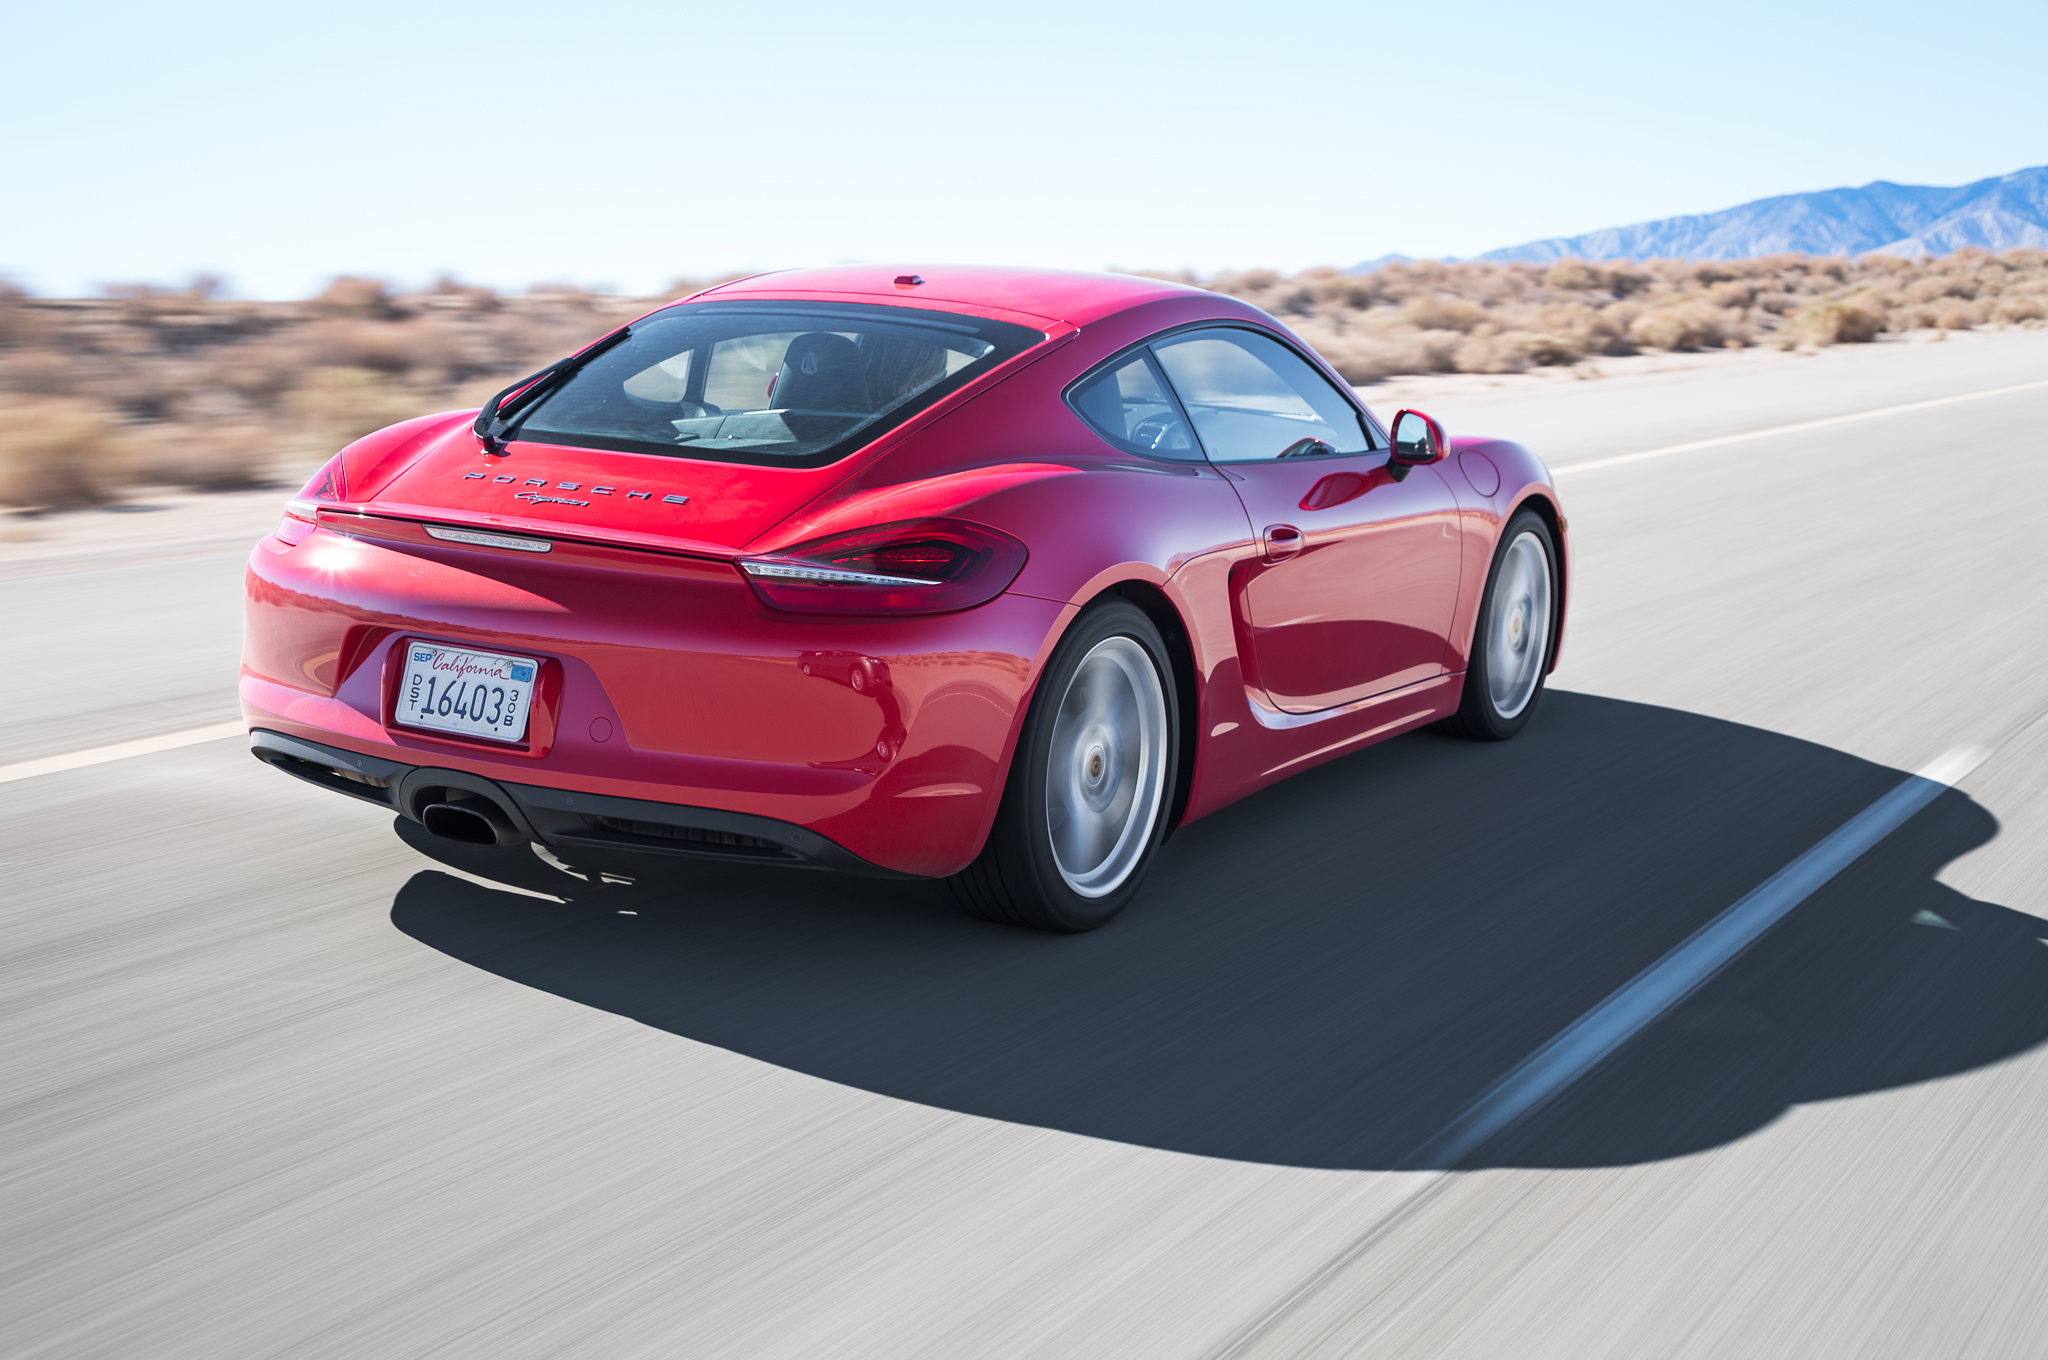 2014 Porsche Cayman Rear Side View